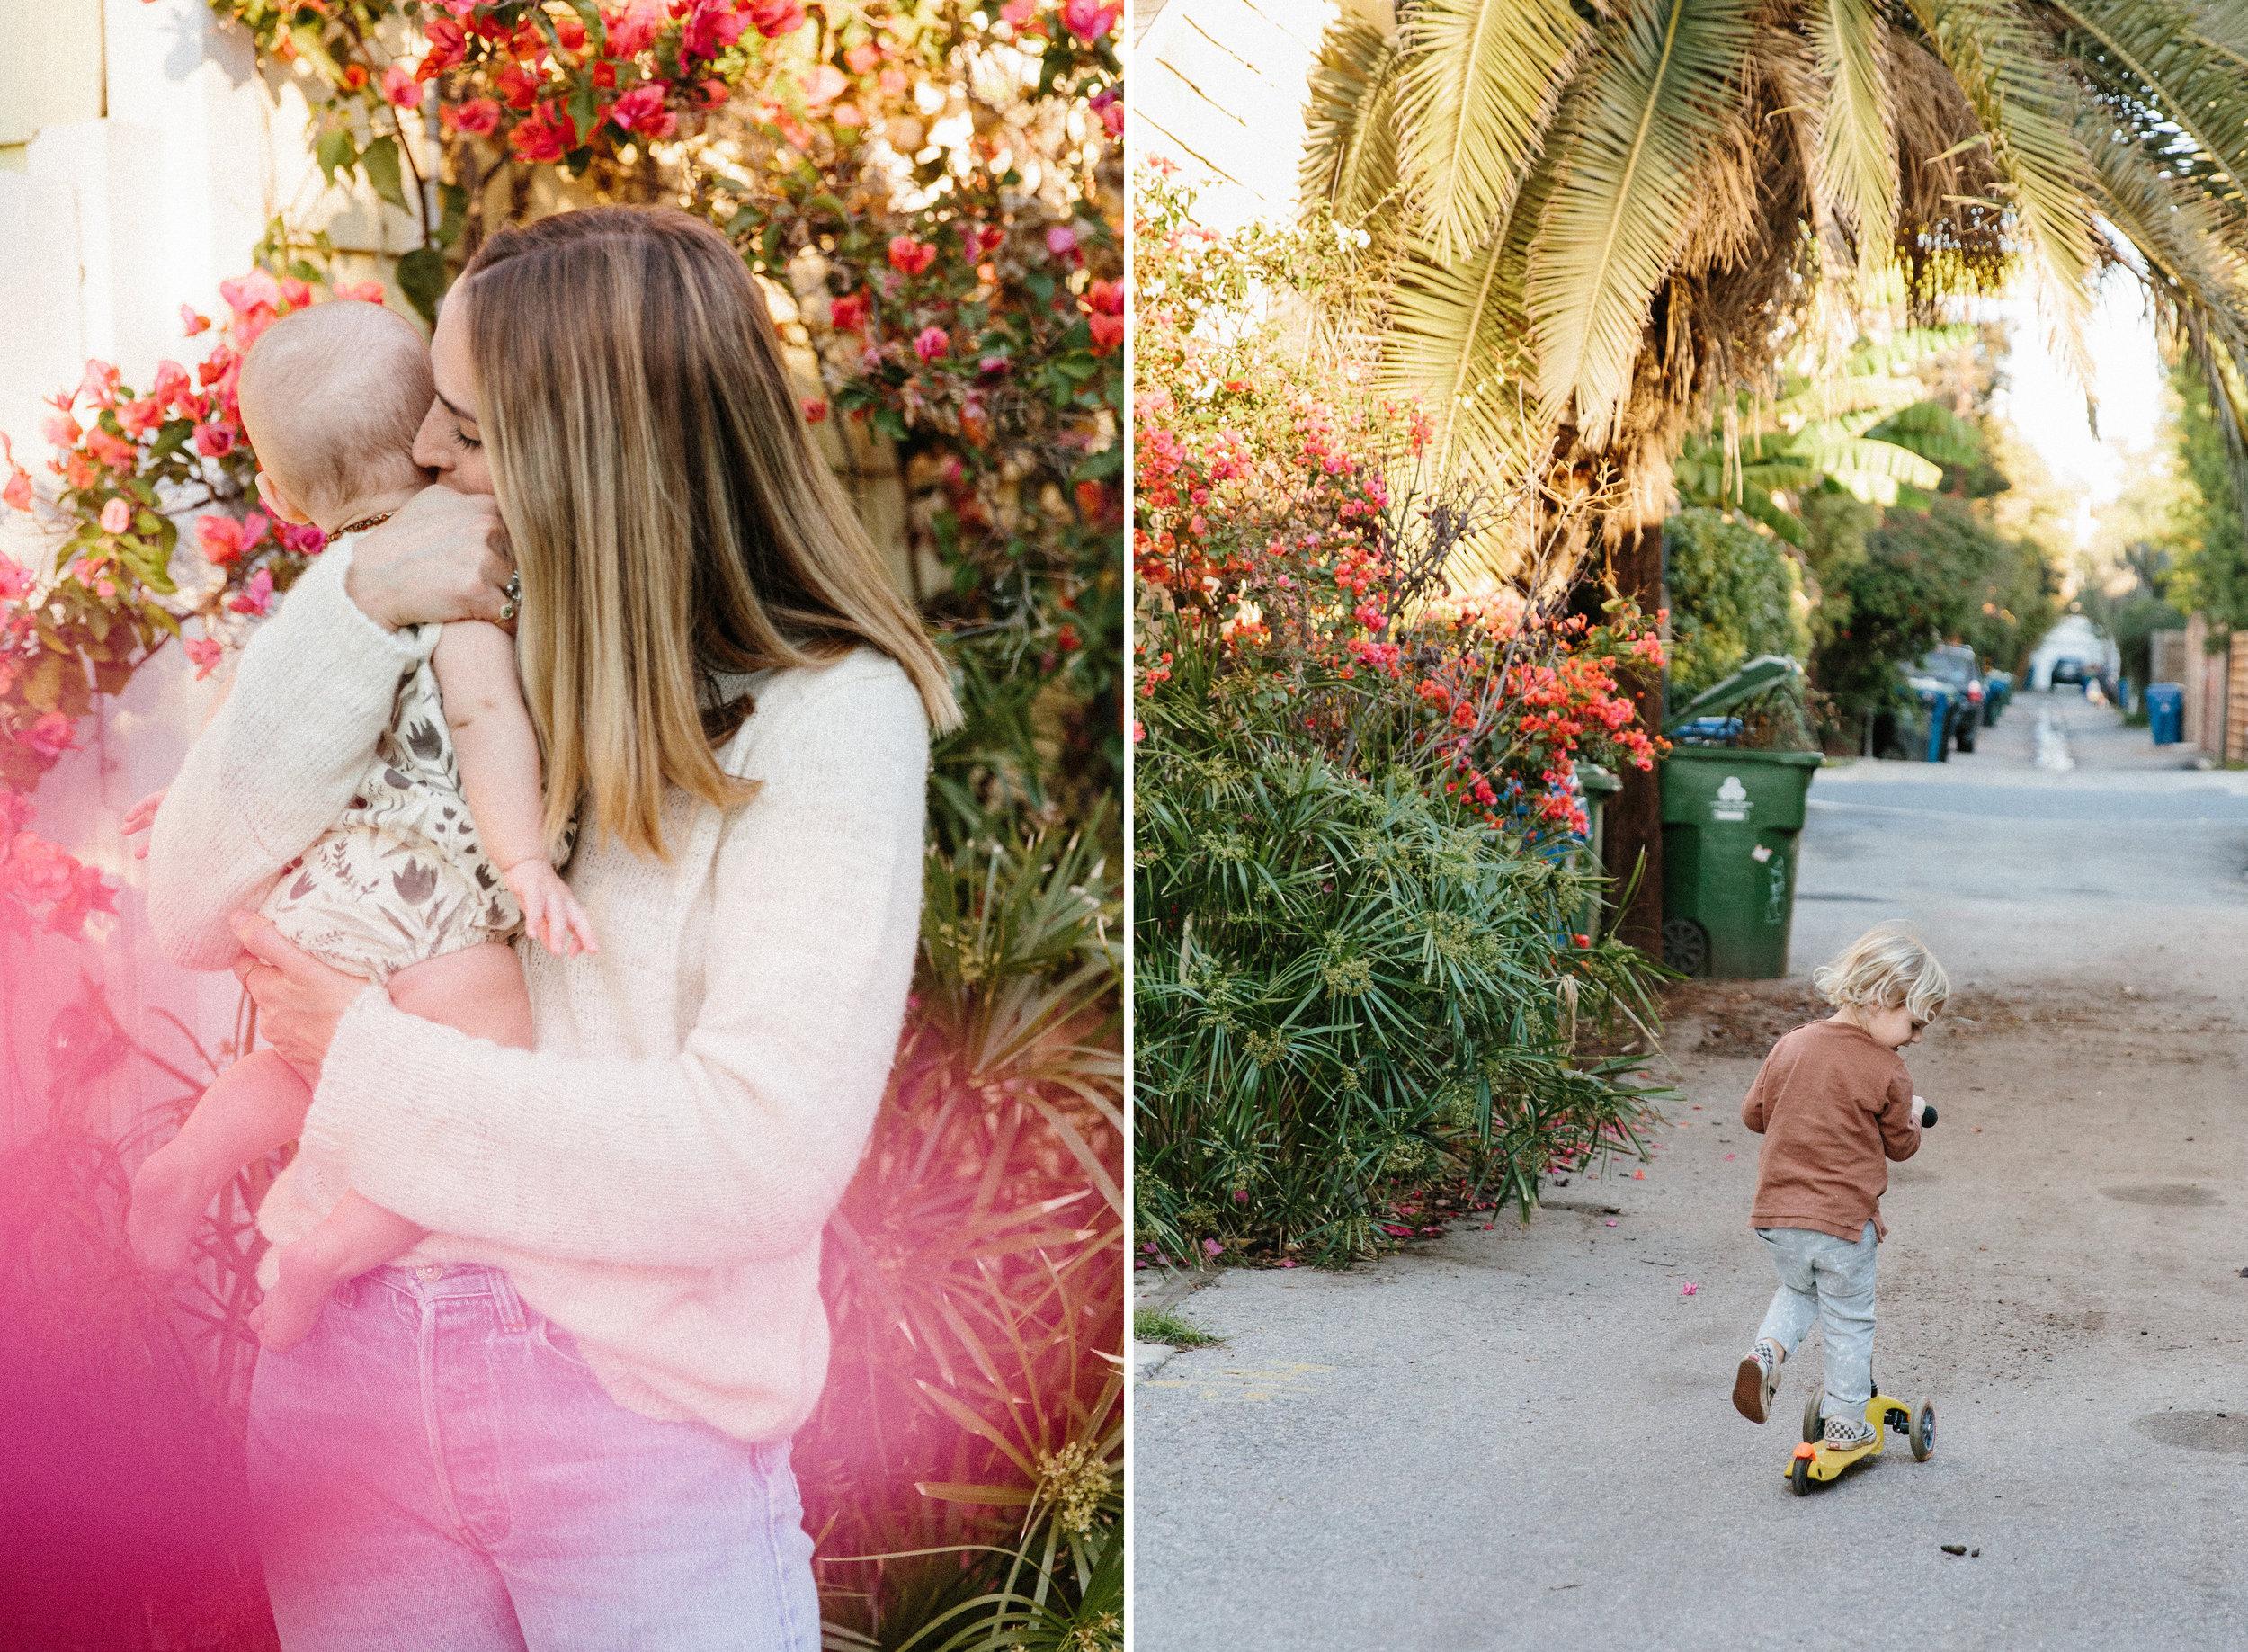 callow-family_venice-los-angeles-baby-child-family-photographer_nicki-sebastian-photography_8.jpg